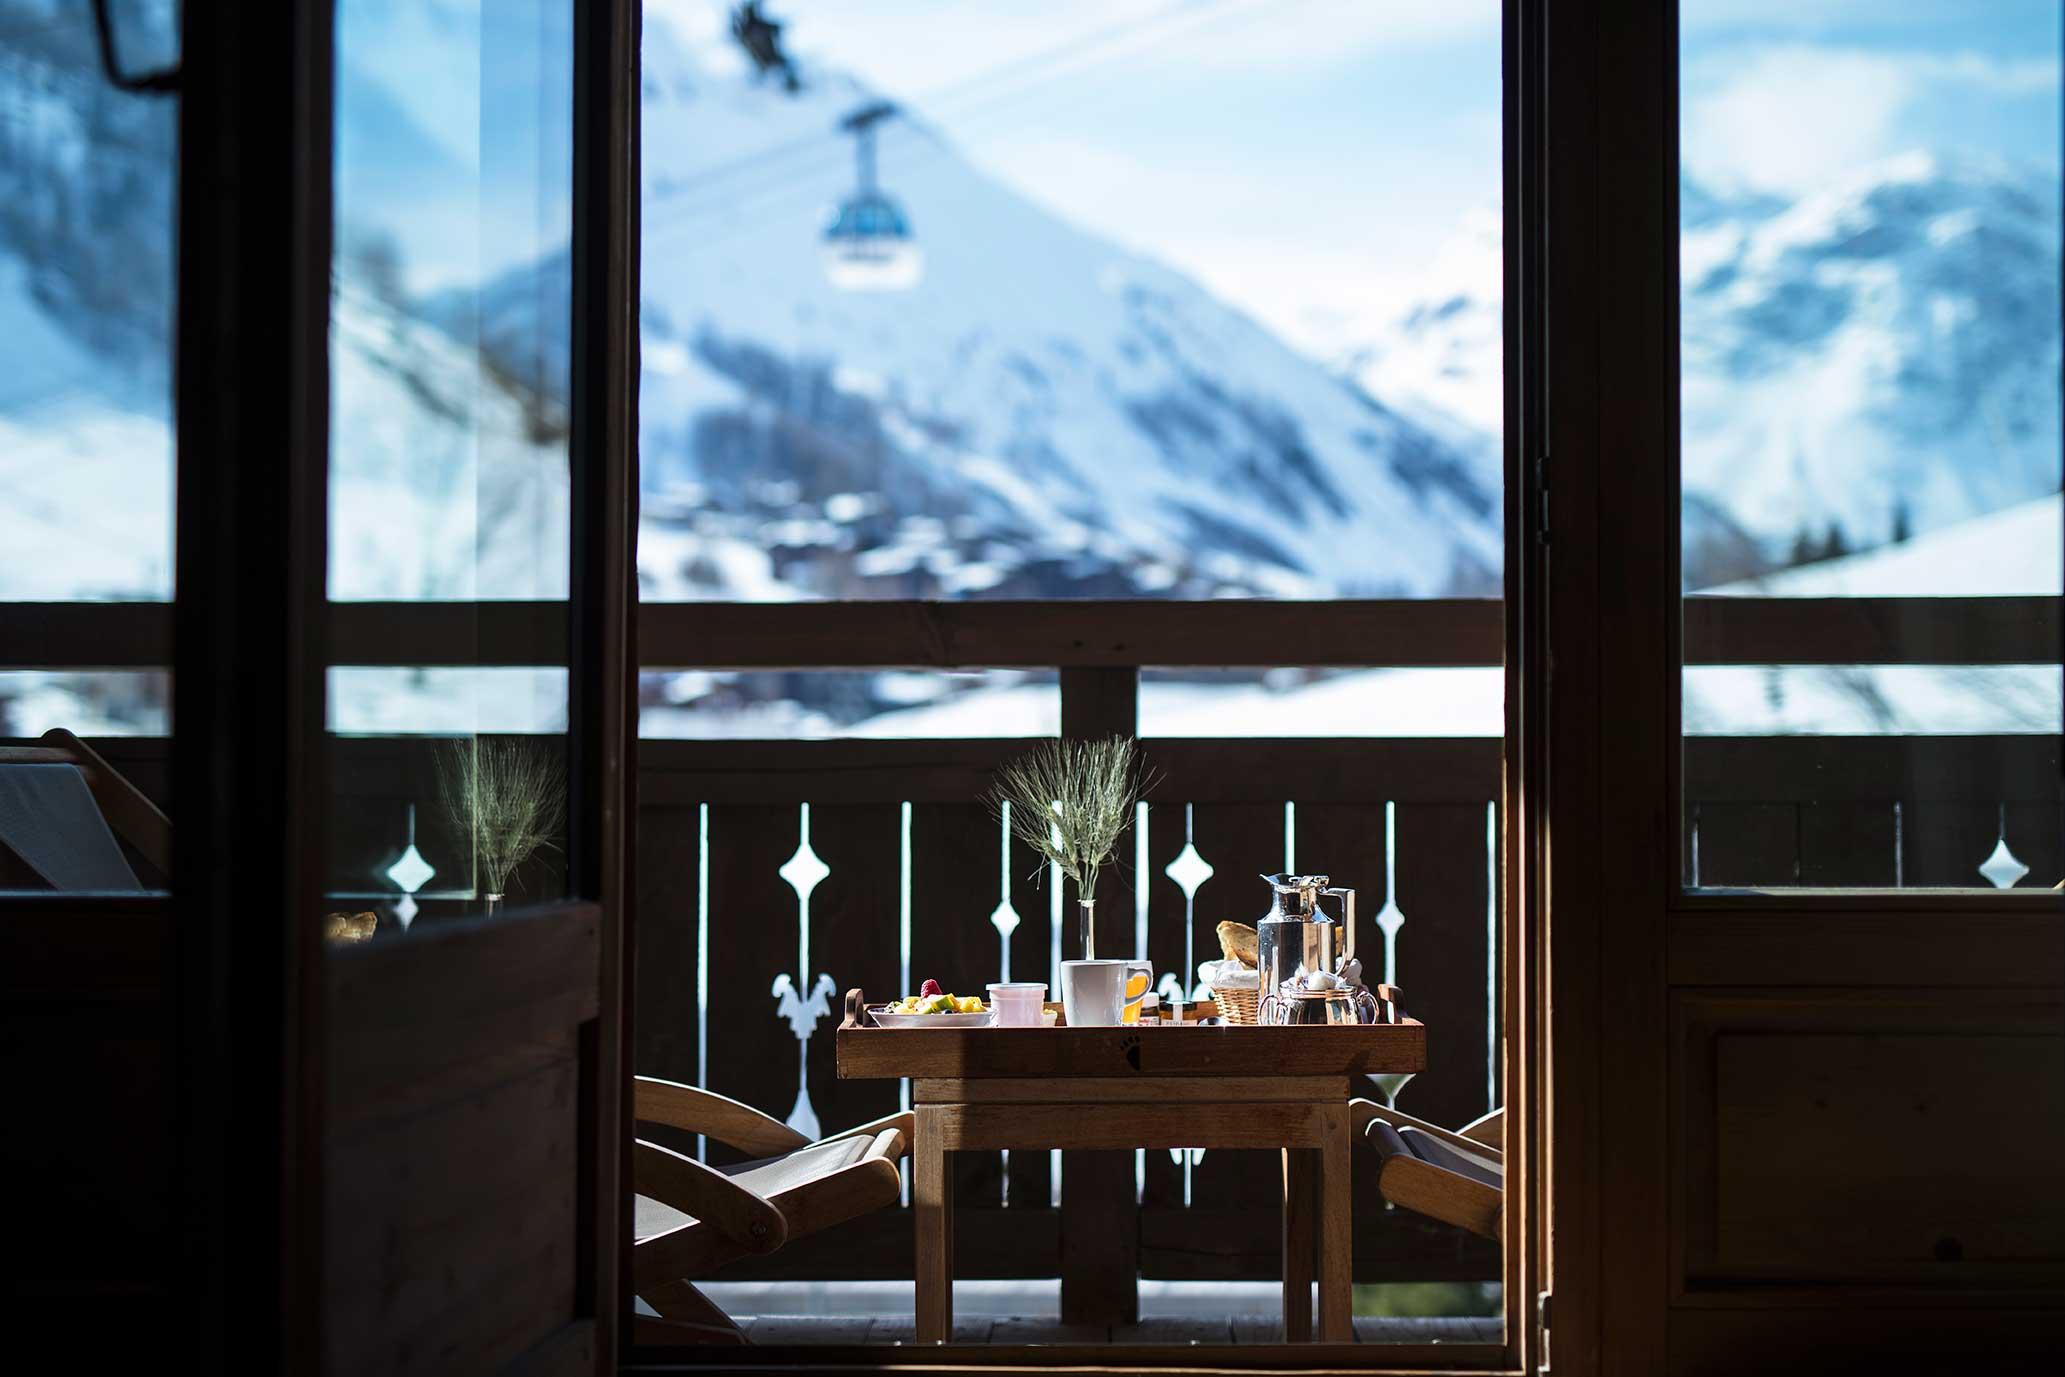 montagne, neige, escapade, weekends, Val d'Isère